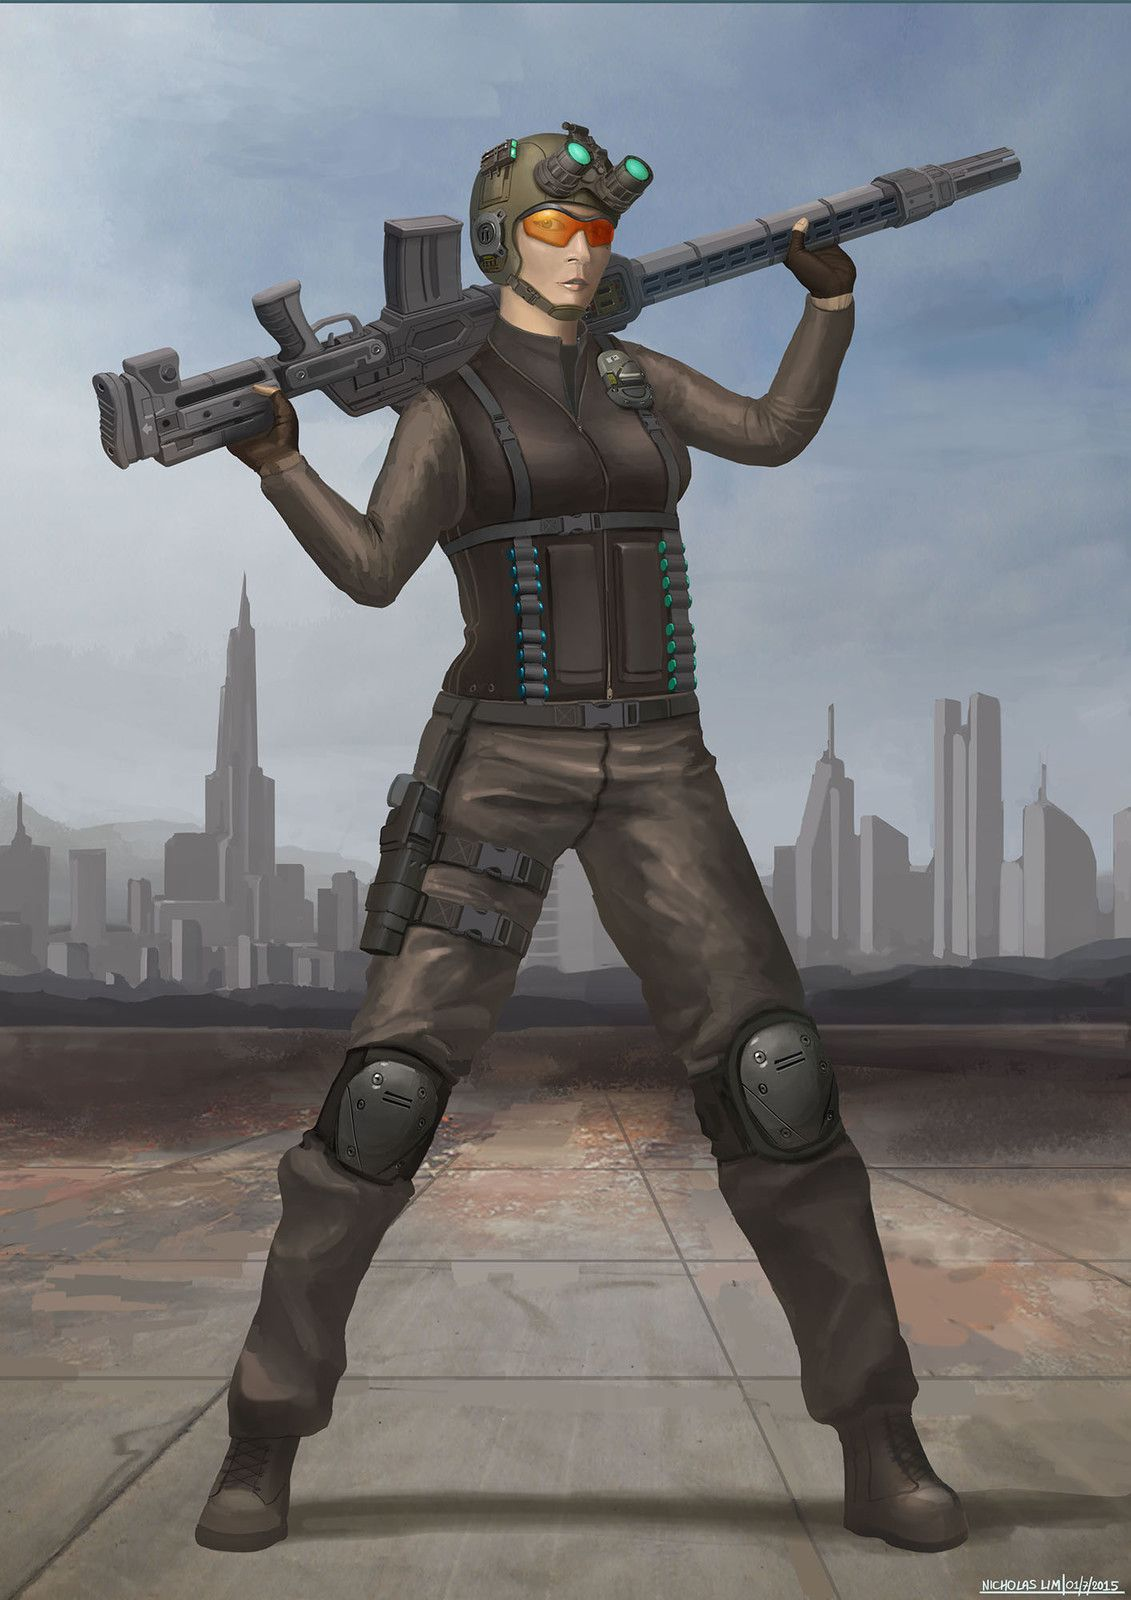 Pin by farlas 816 on scifi 1 in 2020 Female armor